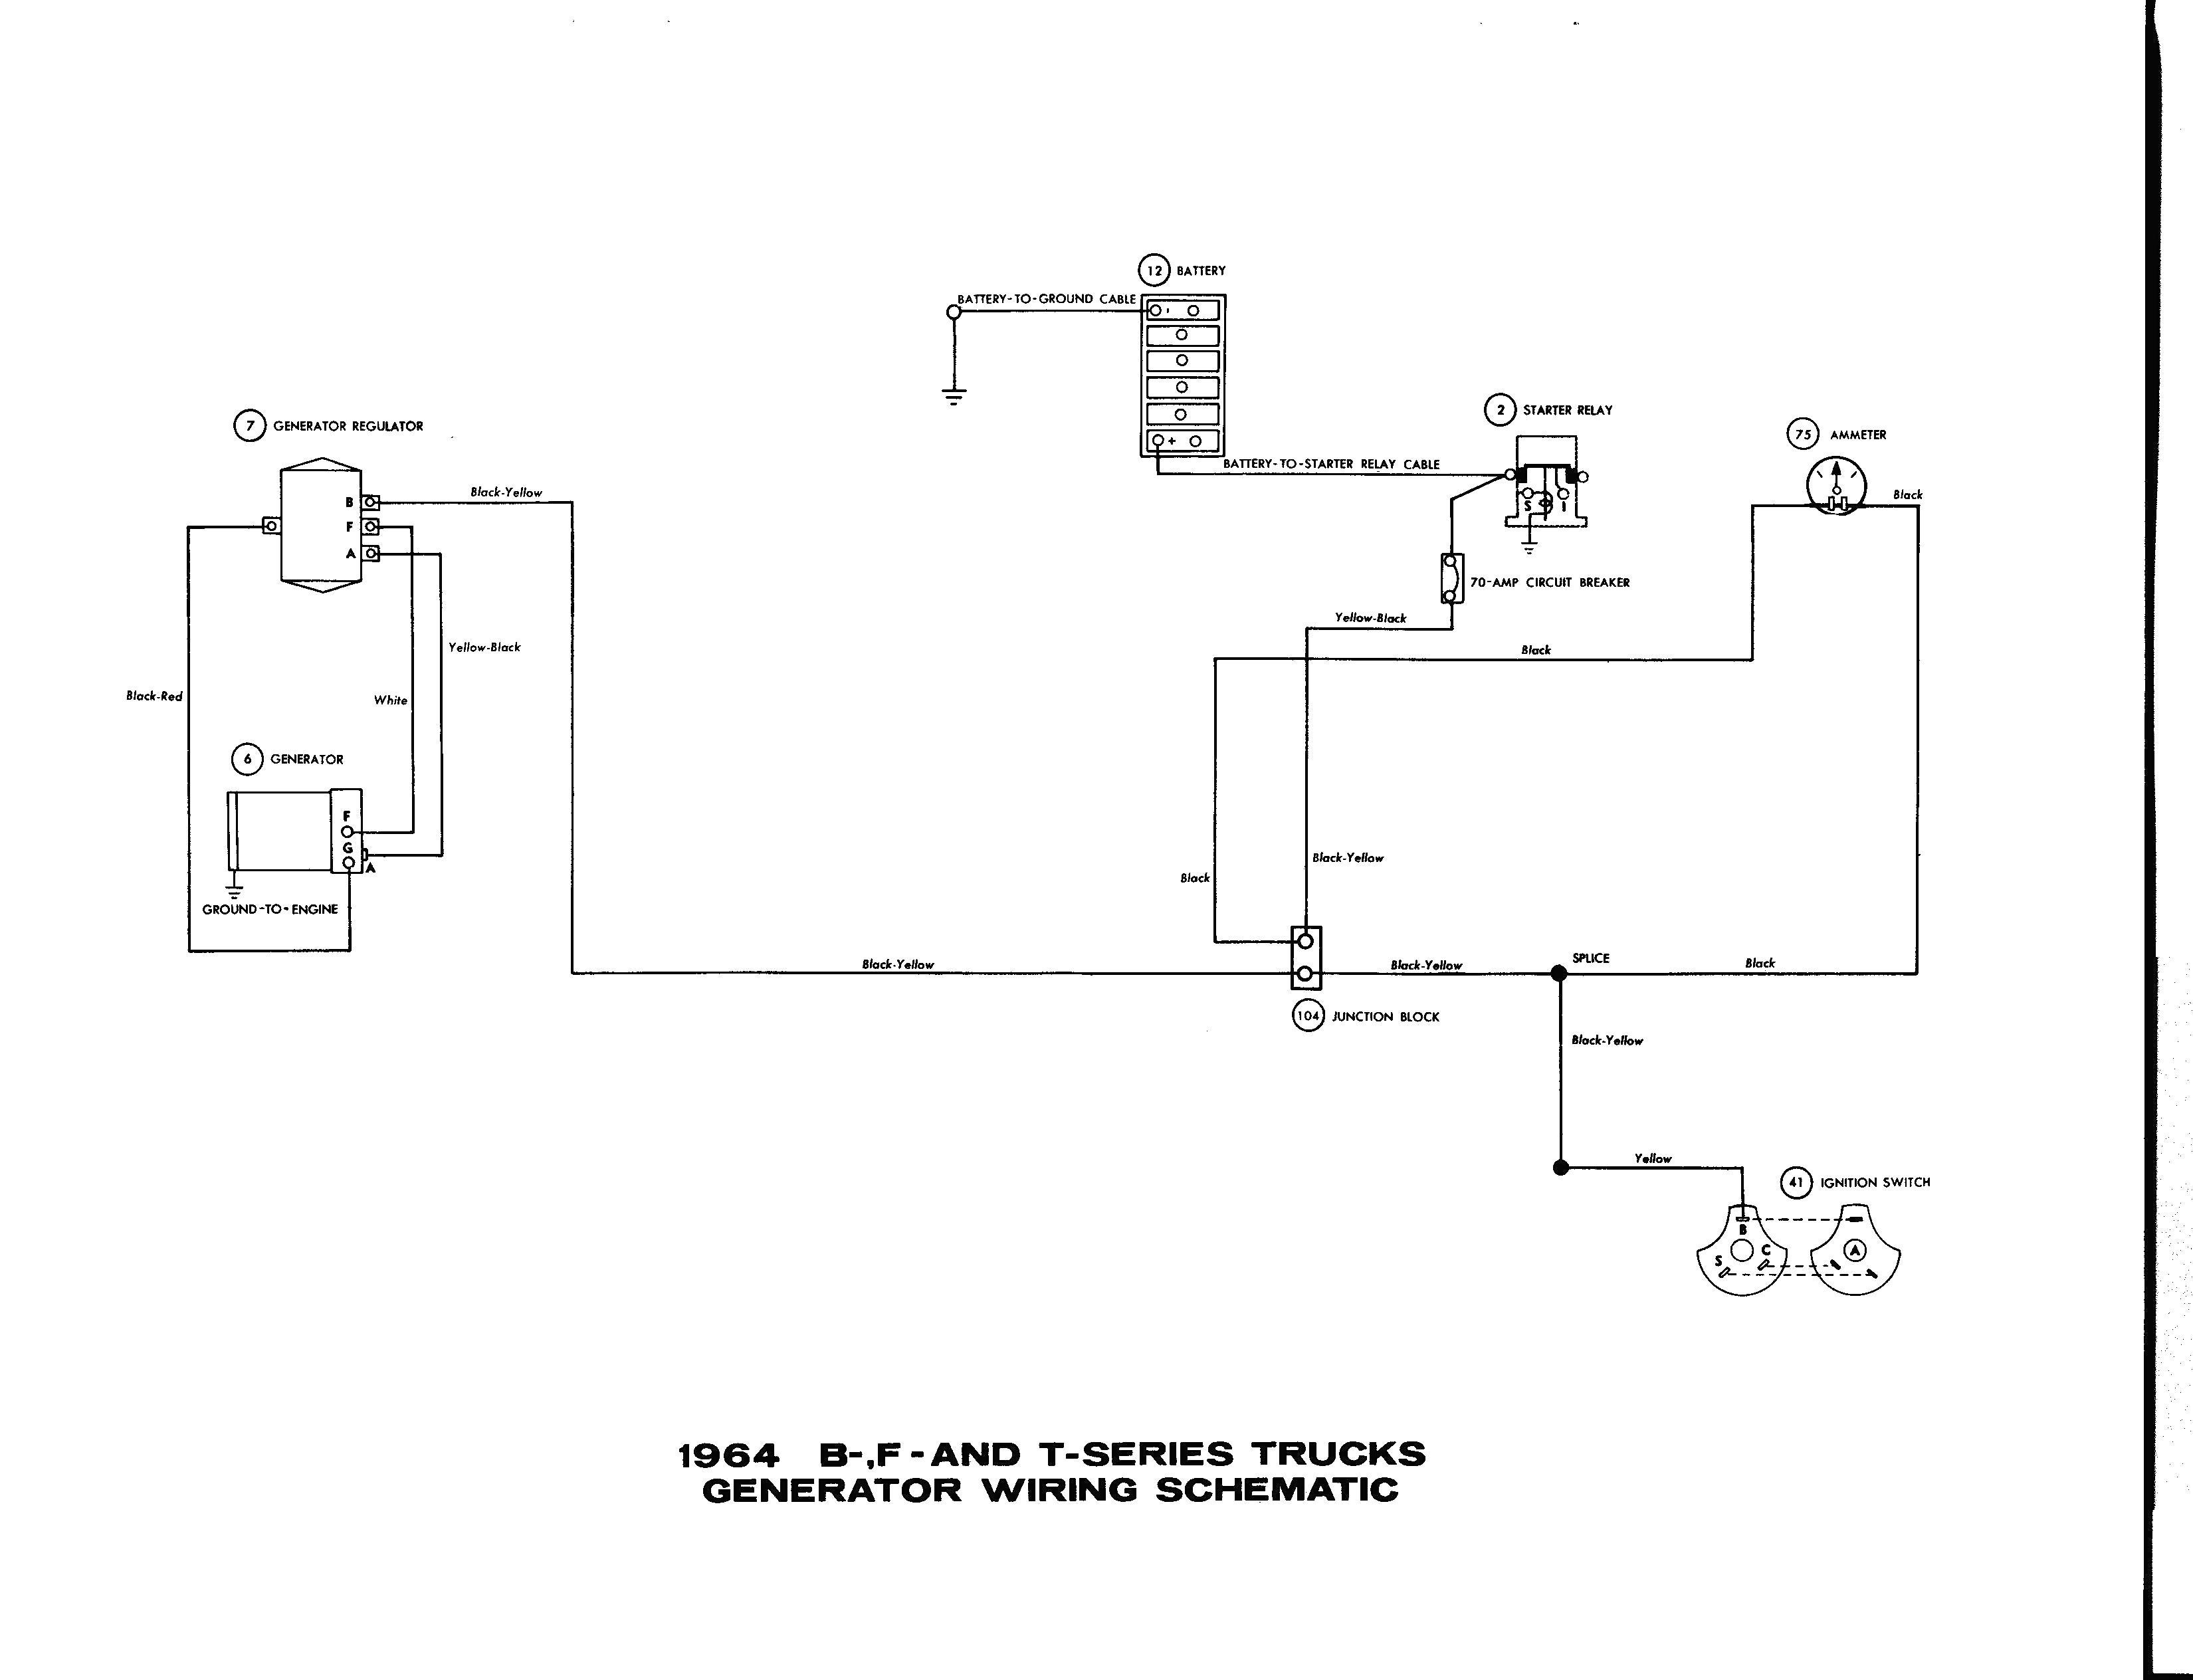 Iskra Alternator Wiring Diagram Appealing ford Transit ... on magneti marelli alternator wiring, mando alternator wiring, sev marchal alternator wiring, chevy 3 wire alternator wiring, leece neville alternator wiring, delco remy alternator wiring, valeo alternator wiring, sbc alternator wiring, nippon denso alternator wiring,